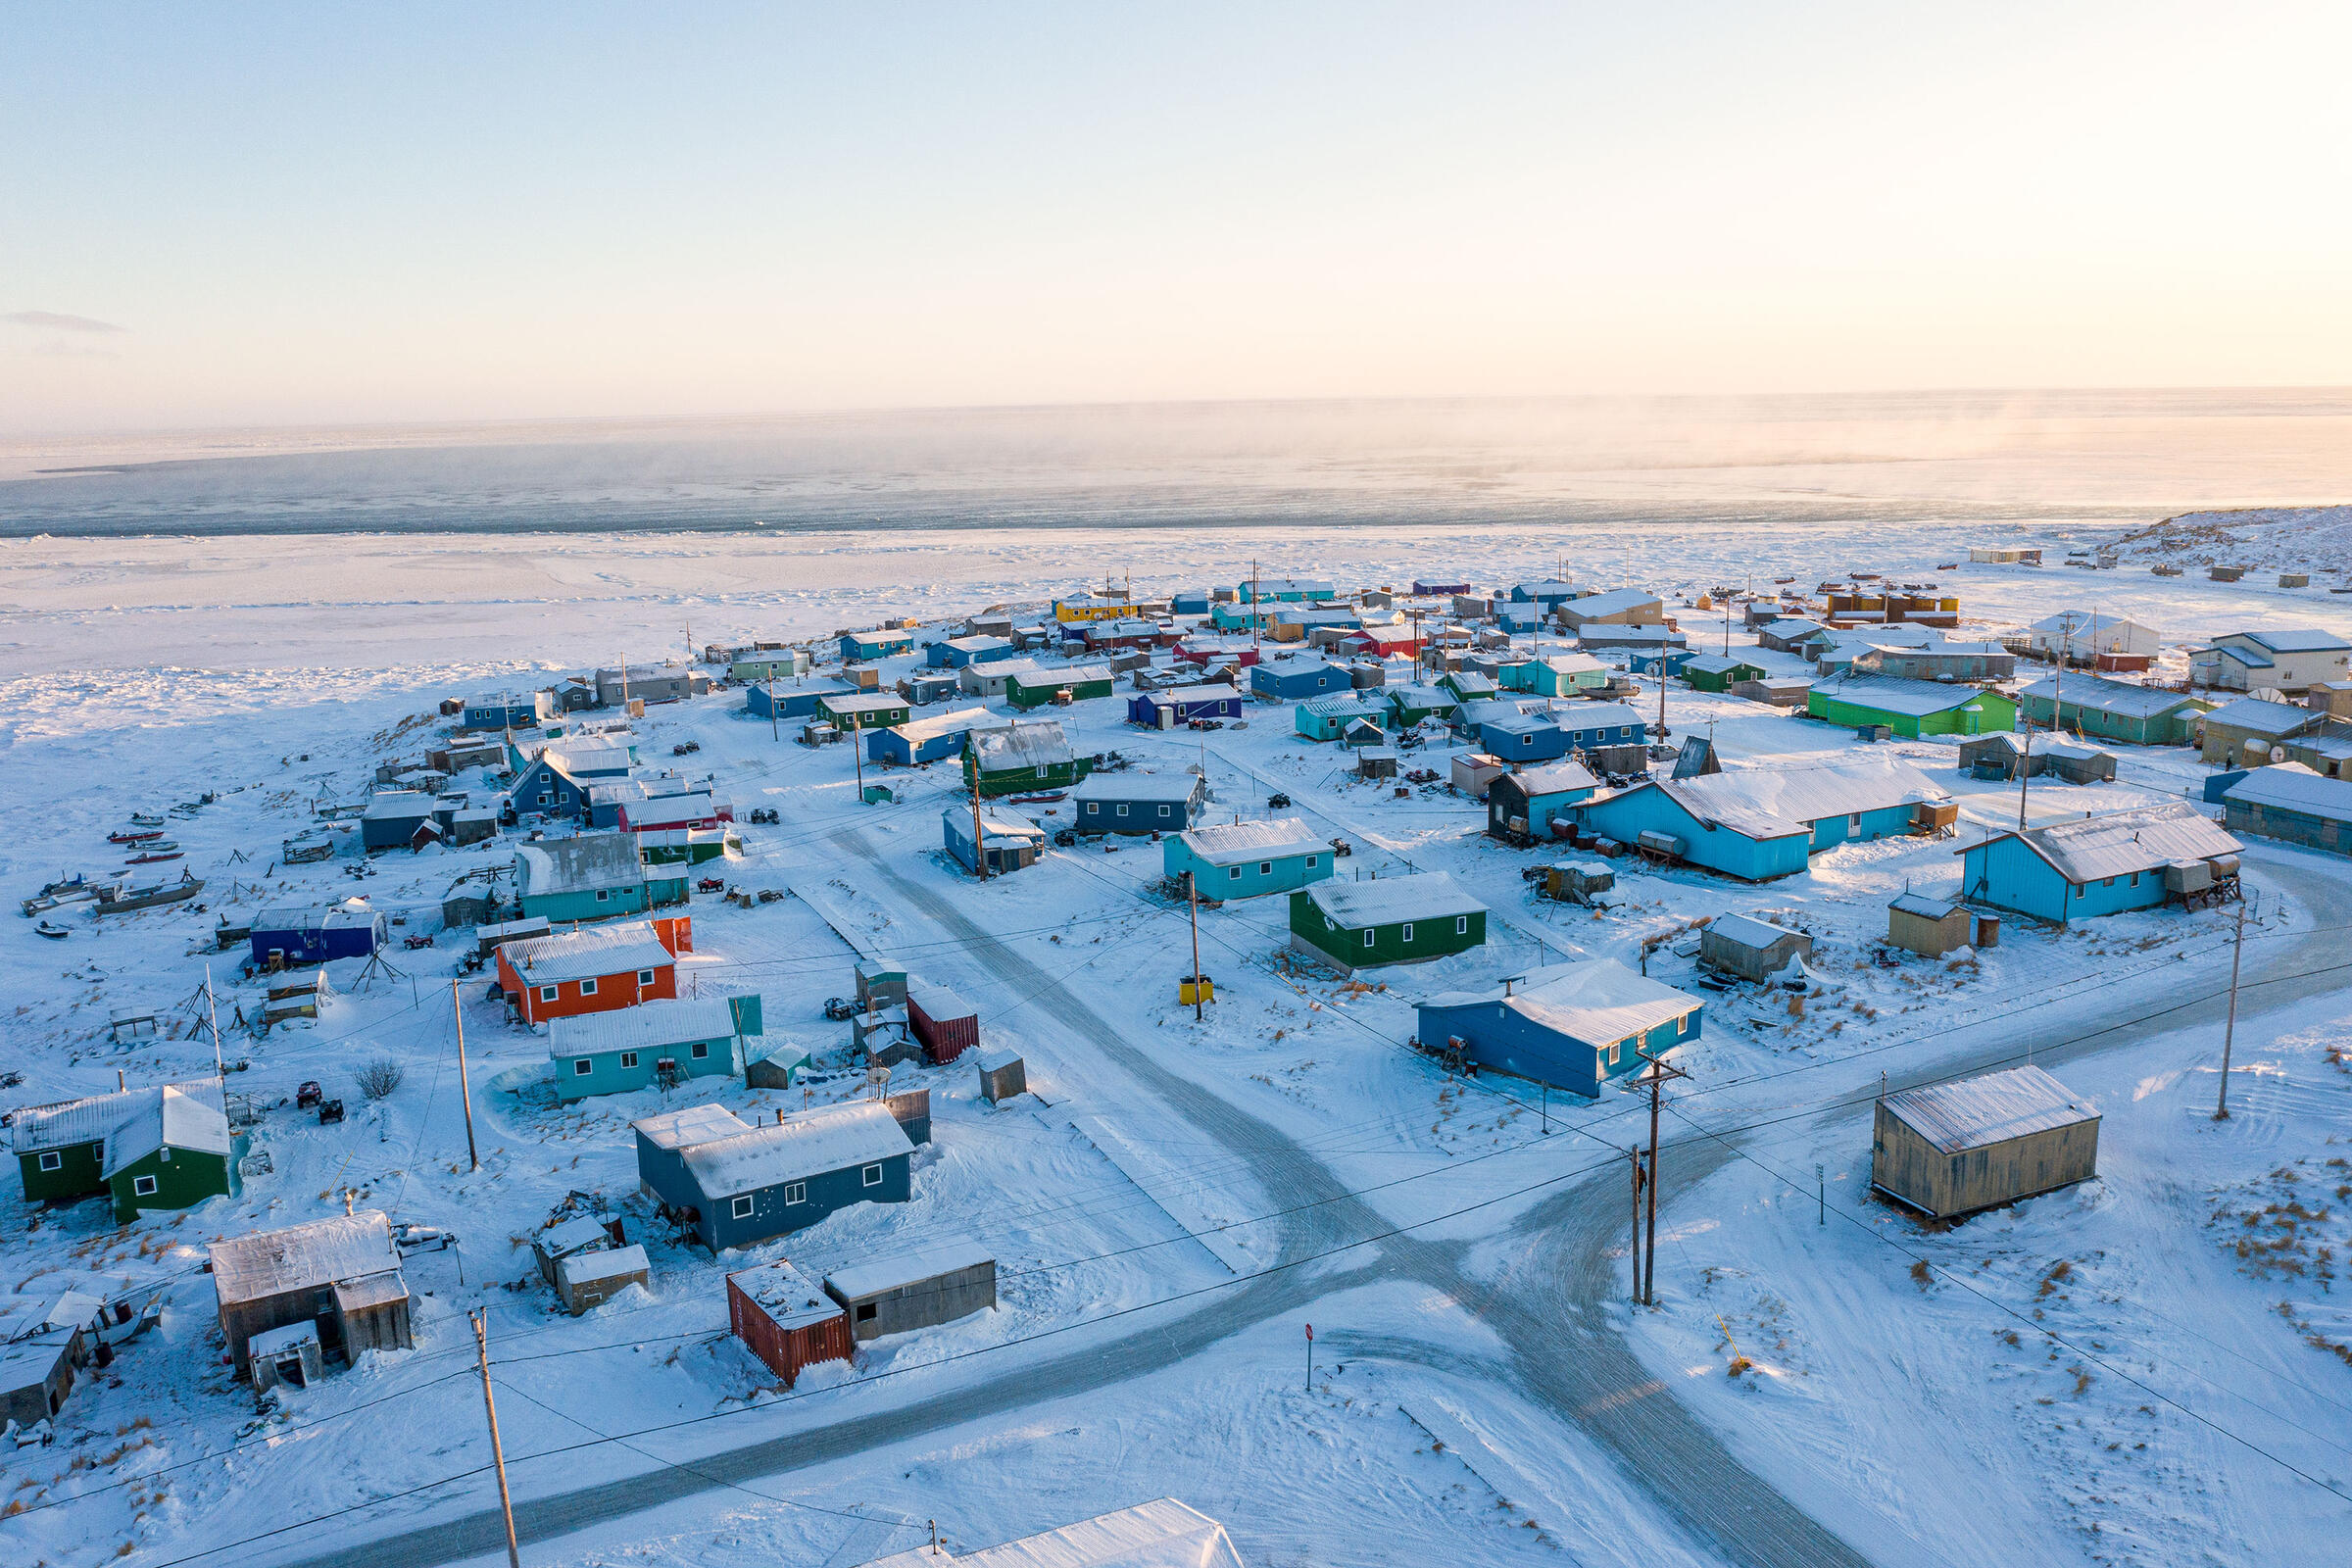 Toksook Bay, Alaska. Matt Hage/U.S. Census Bureau